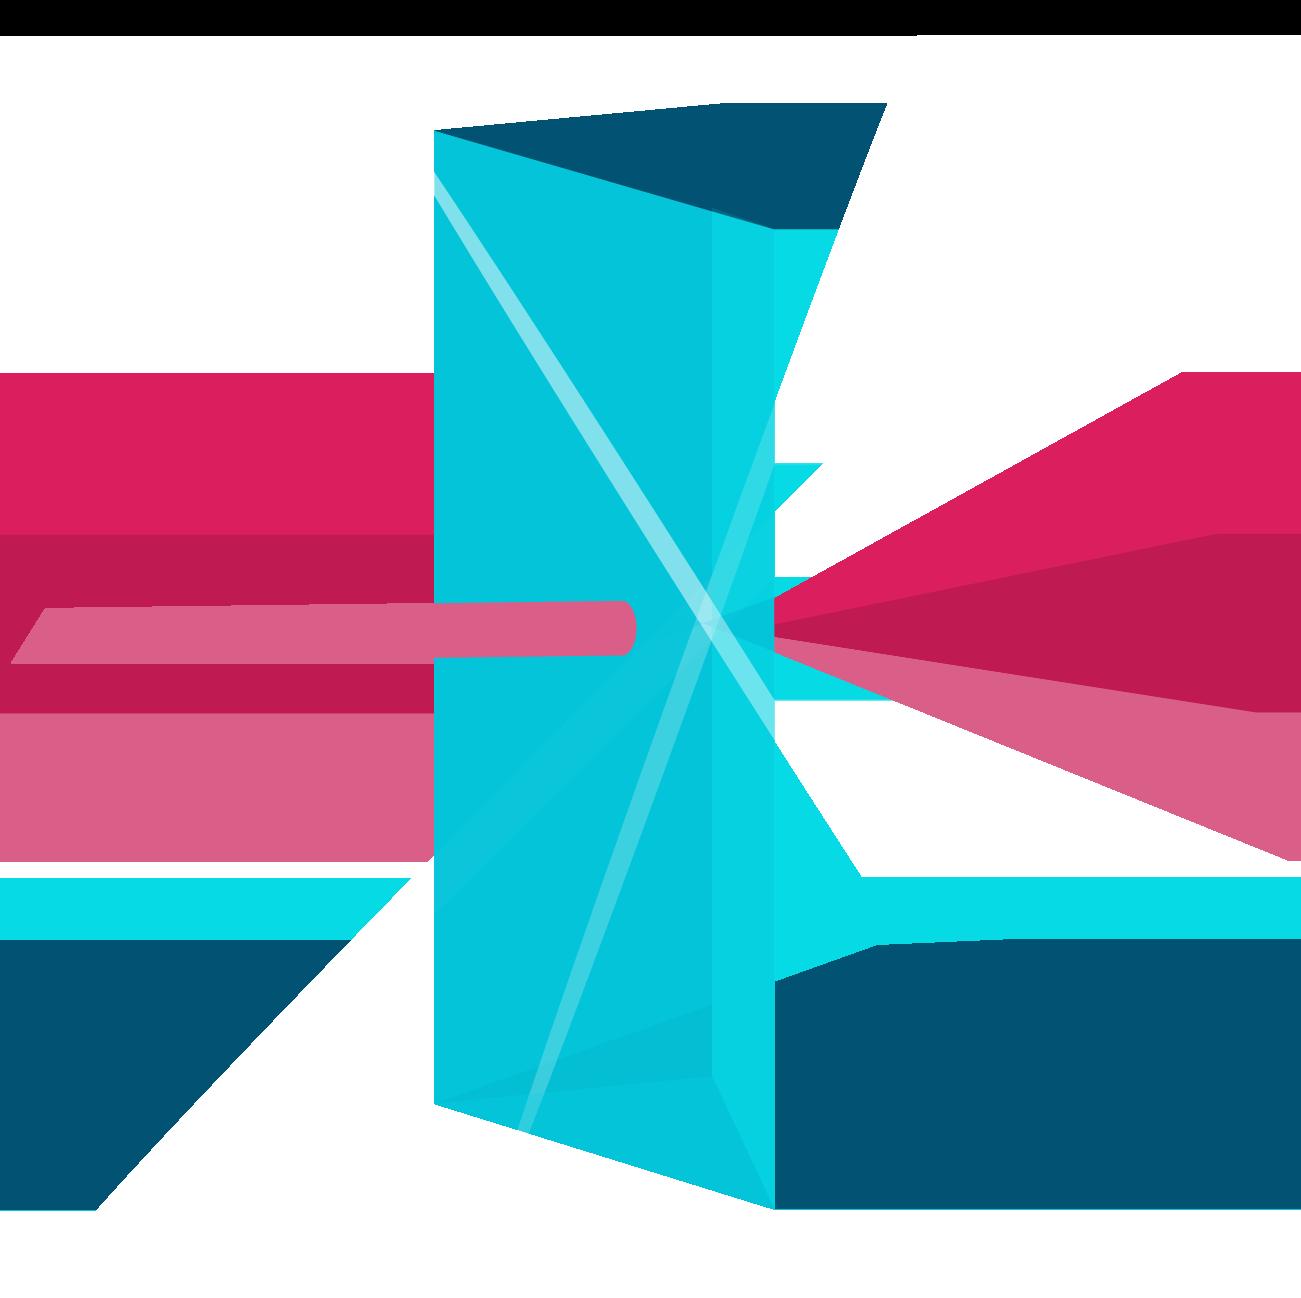 Abstract TV antenae